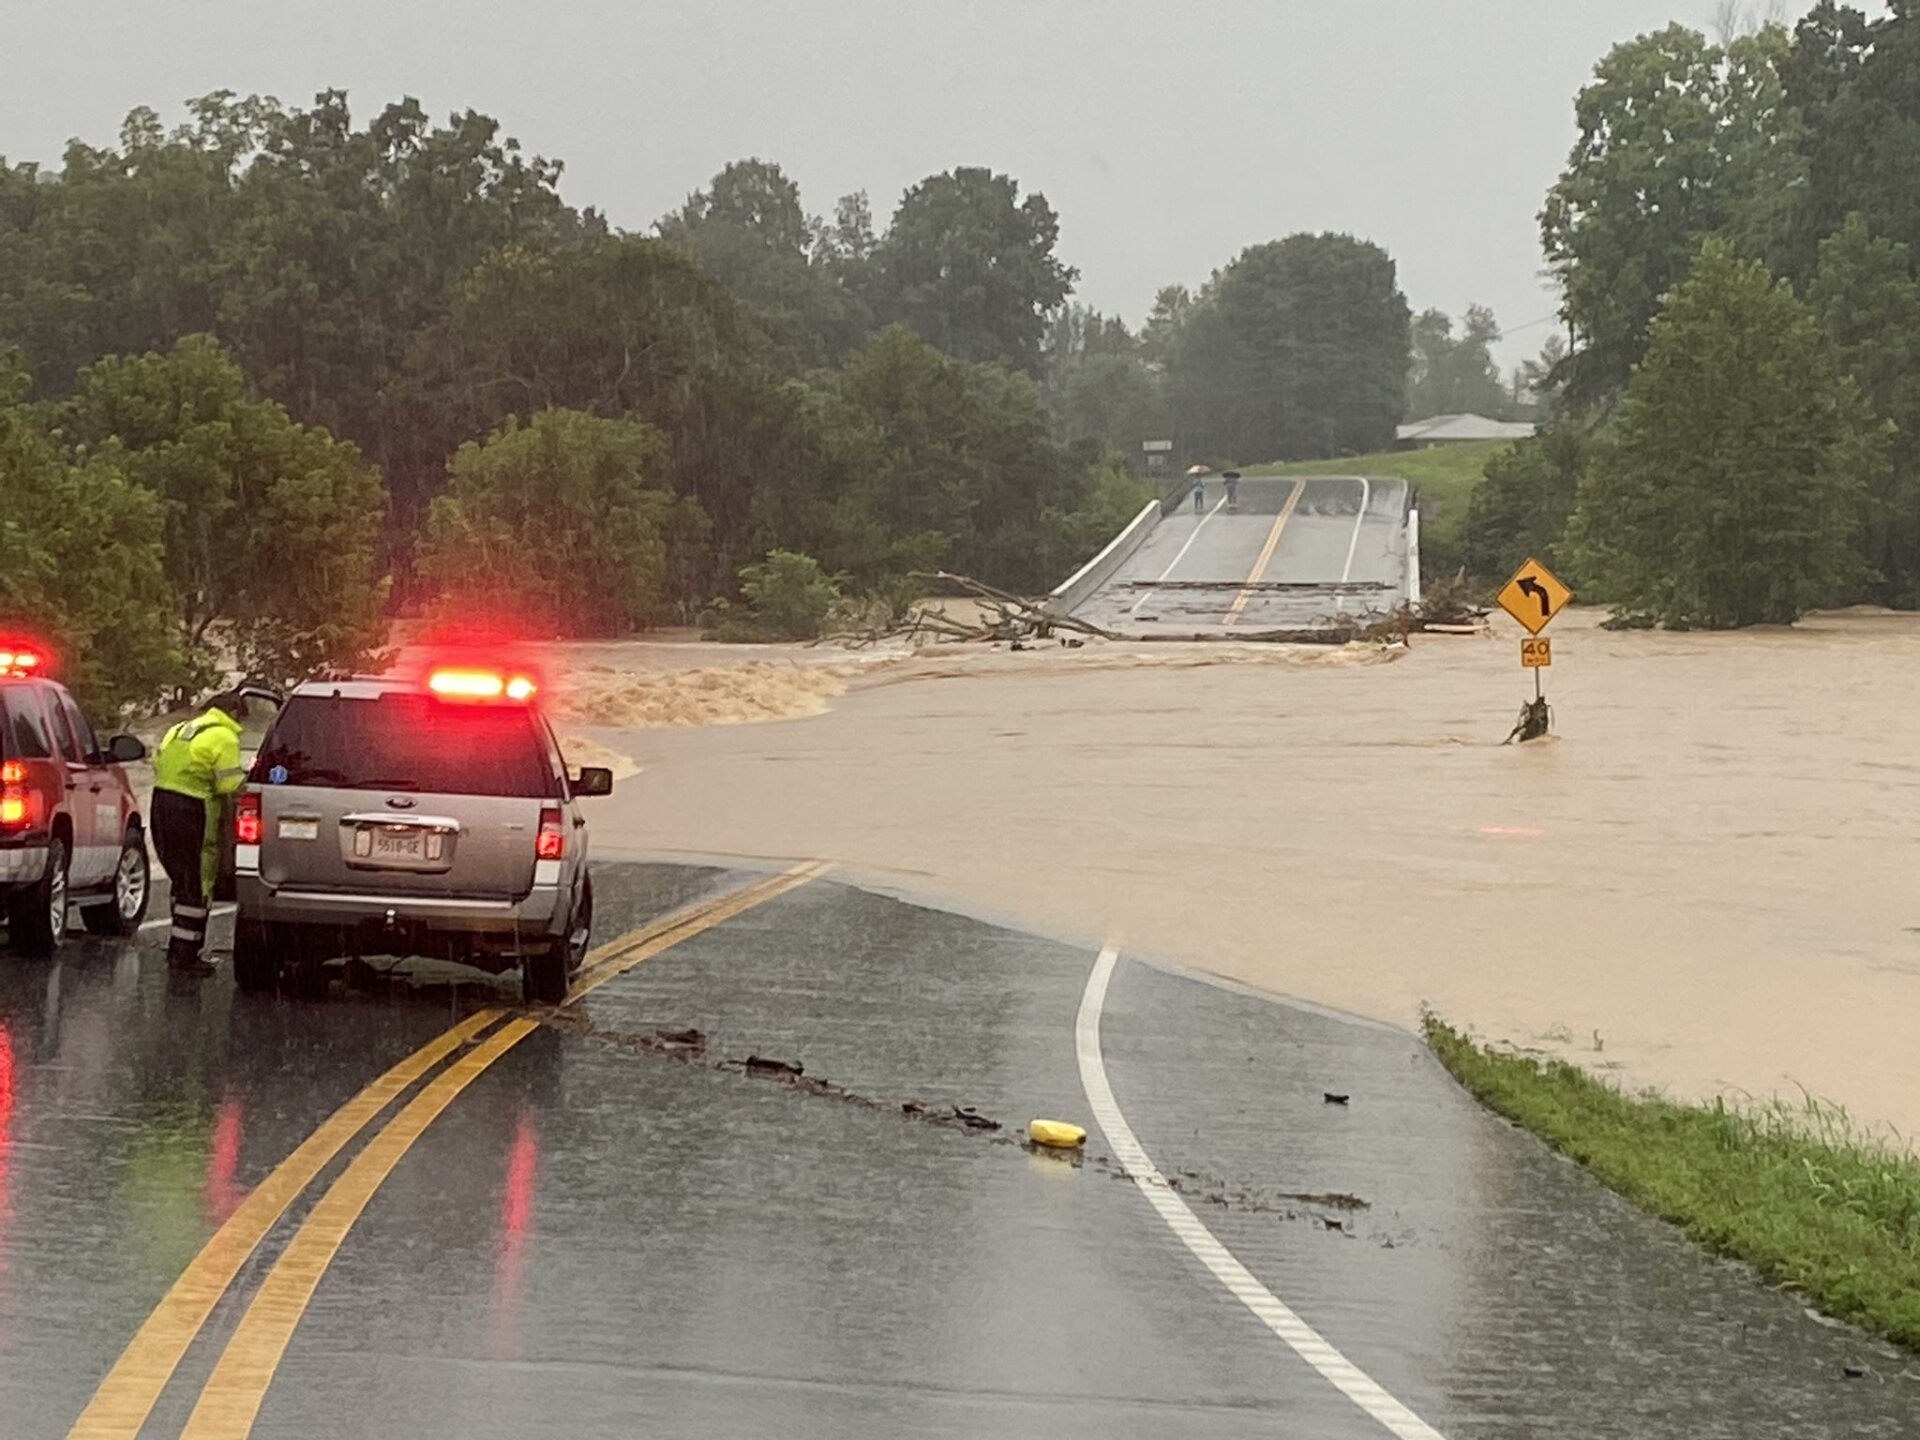 garners creek hickman county flooding 8/21/21